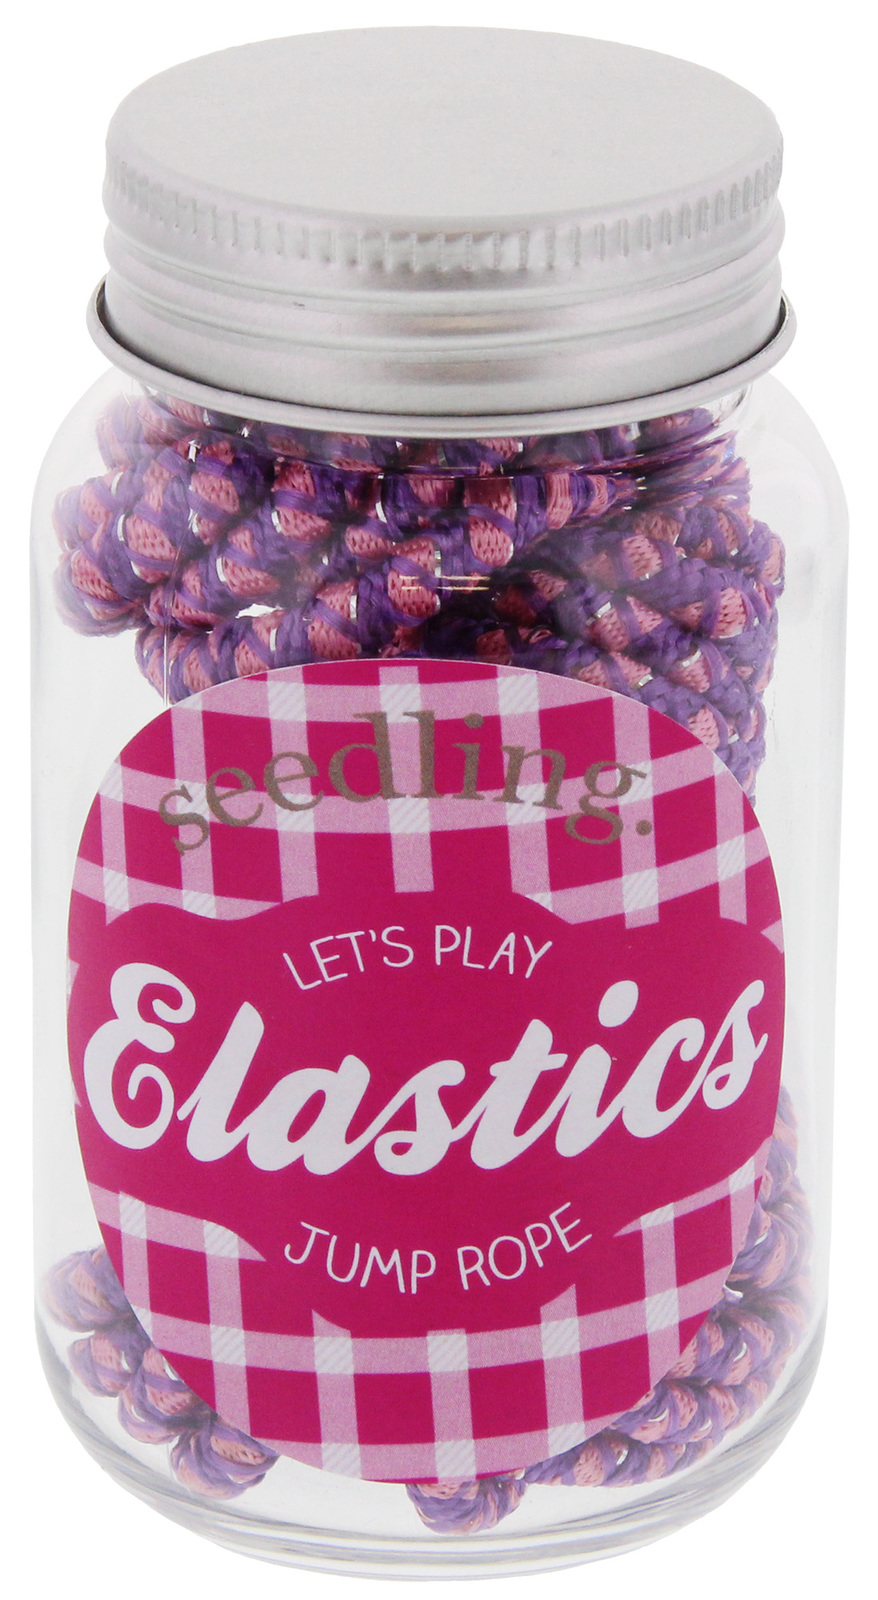 Seedling: Let's Play Elastics Jump Rope - Assorted image